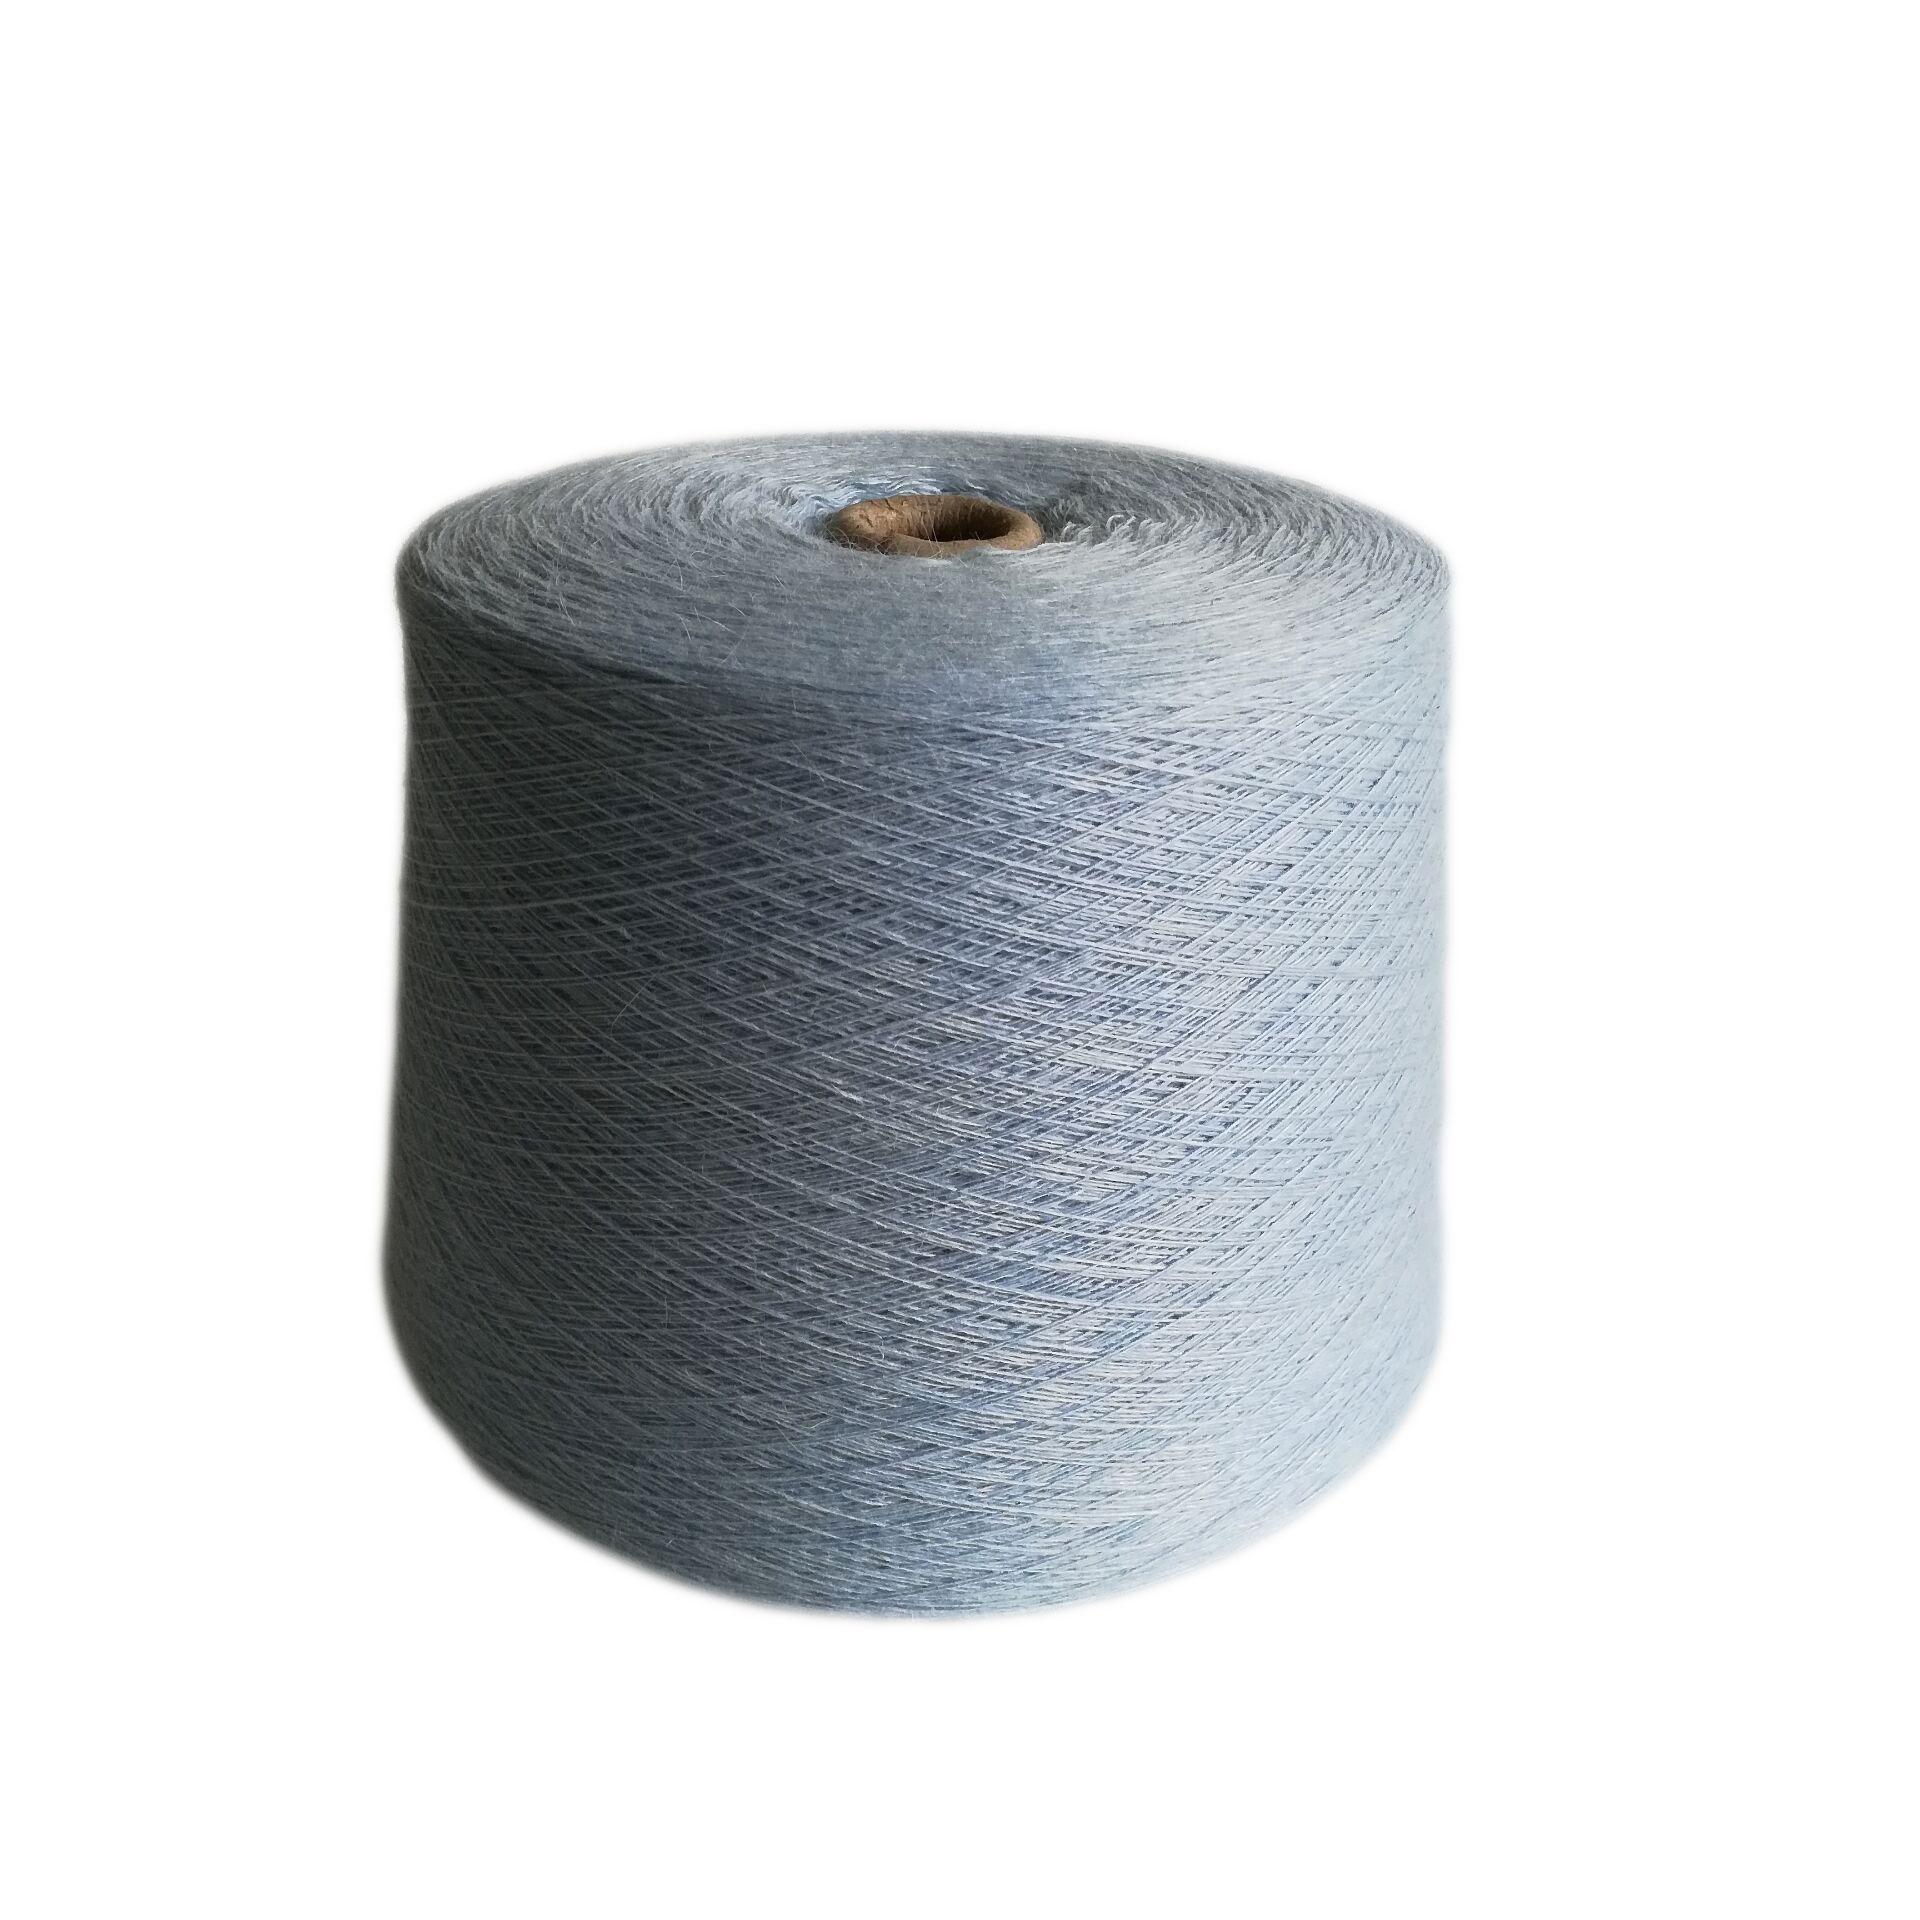 Knitting angora yarn for hat